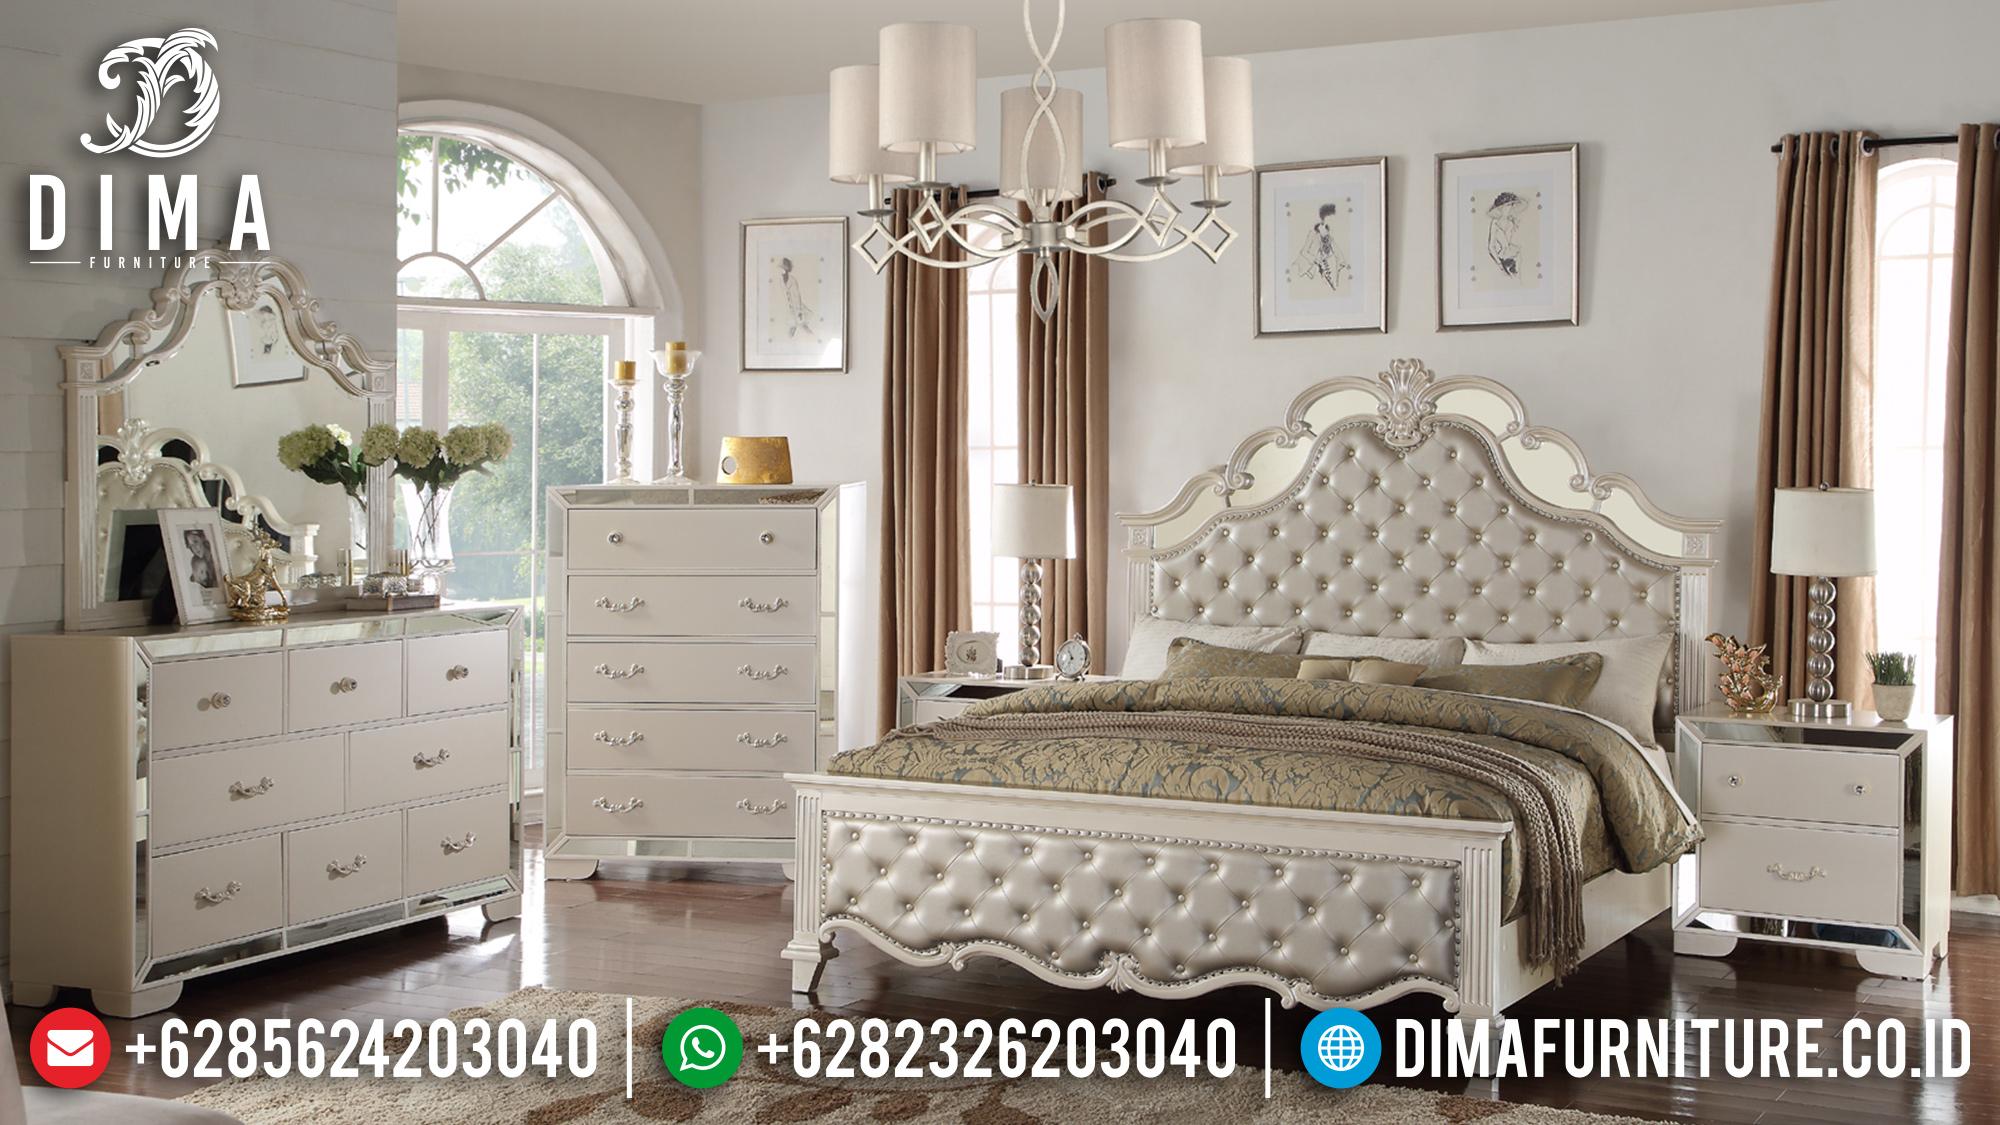 Sonia Tempat Tidur Minimalis Mewah 2019 MMJ-0106